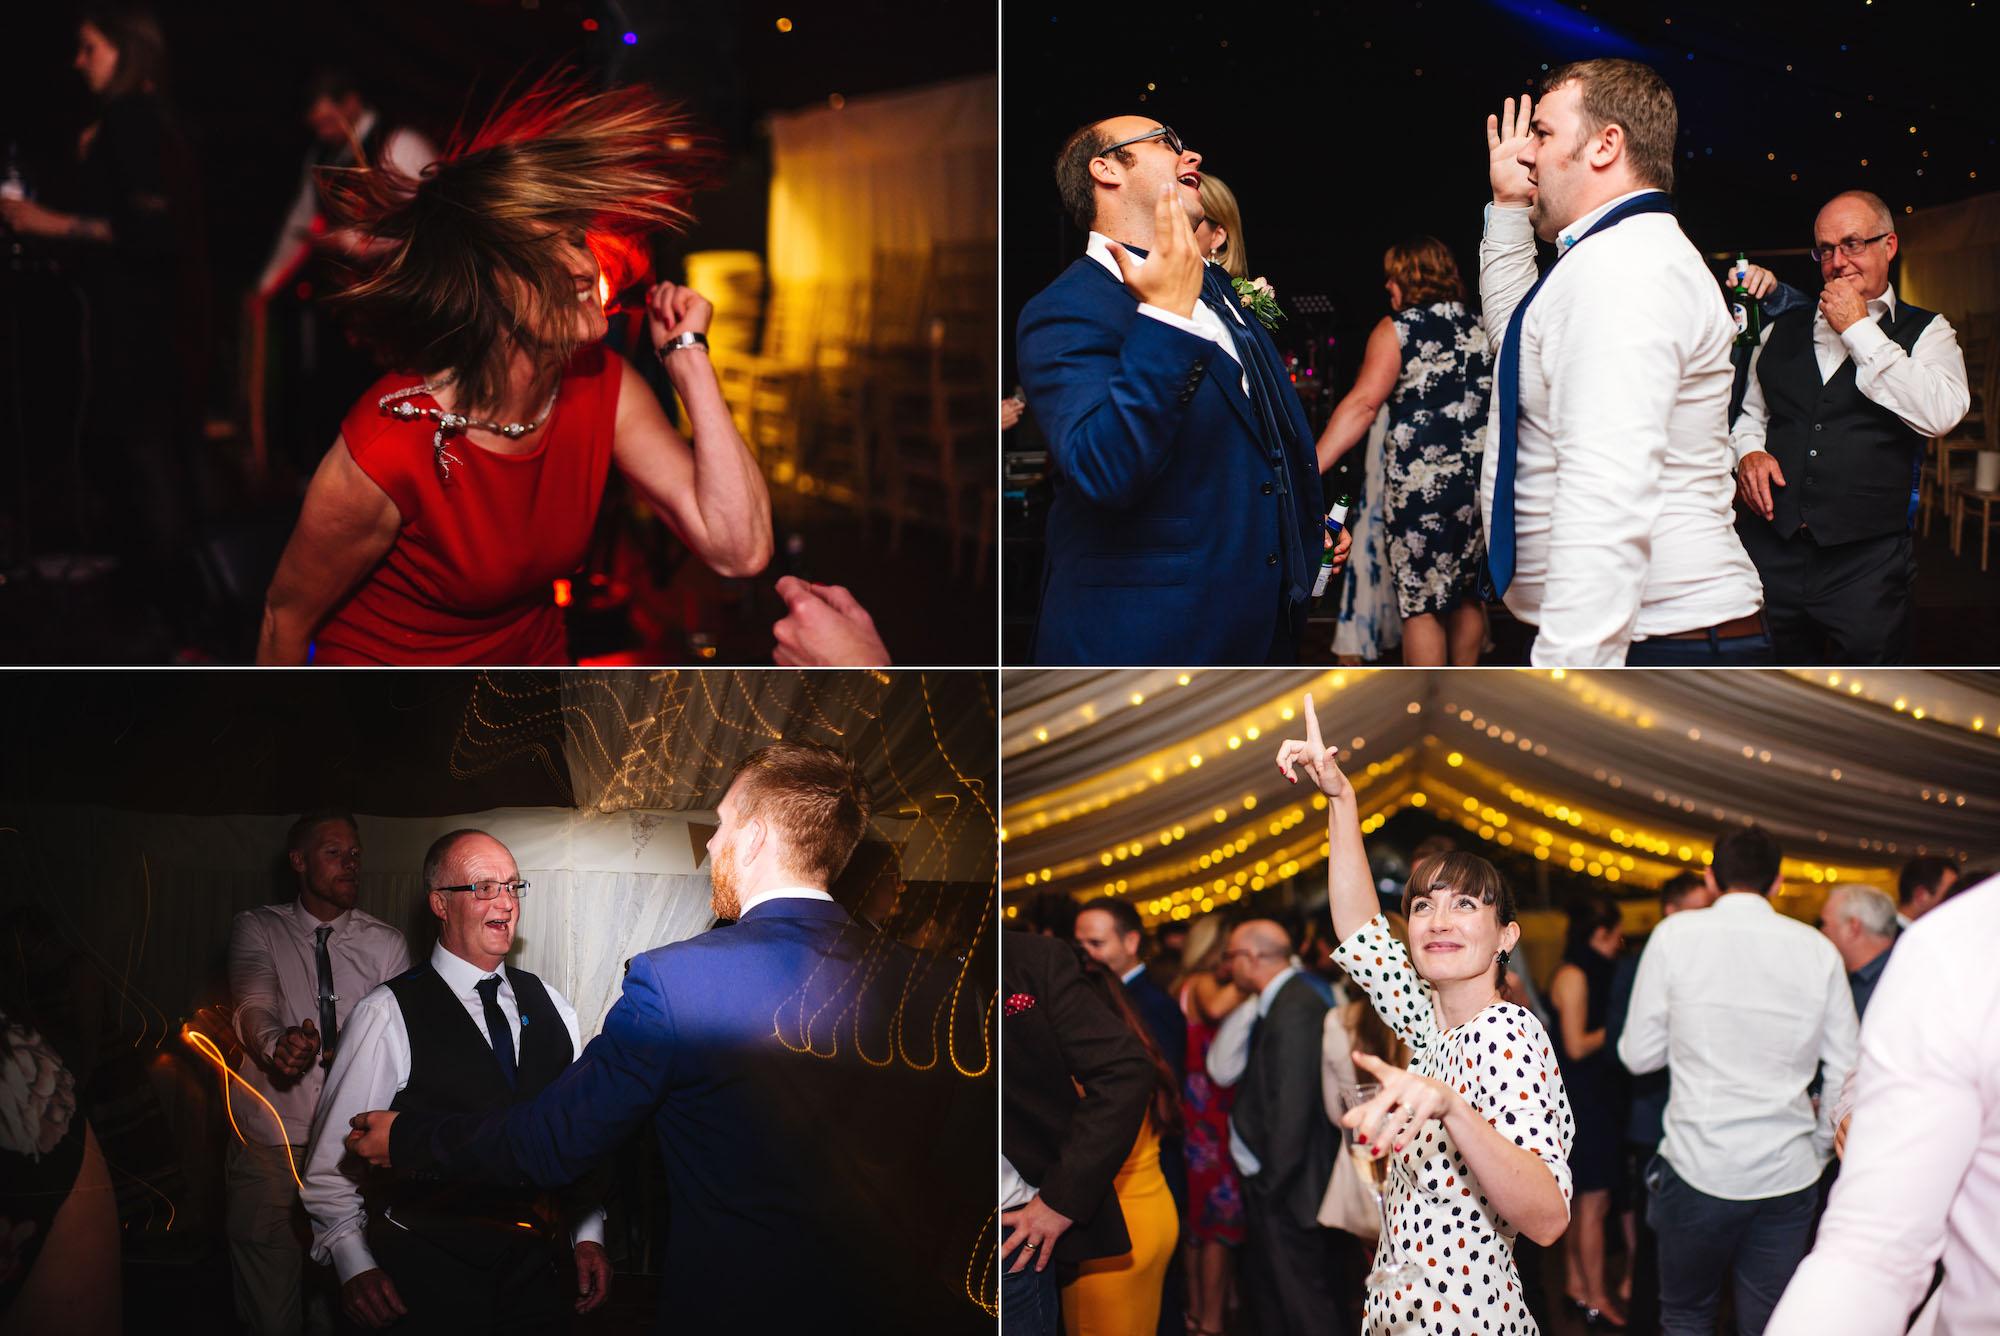 19_Rushall_manor_wiltshire_wedding_photography_dancing.jpg